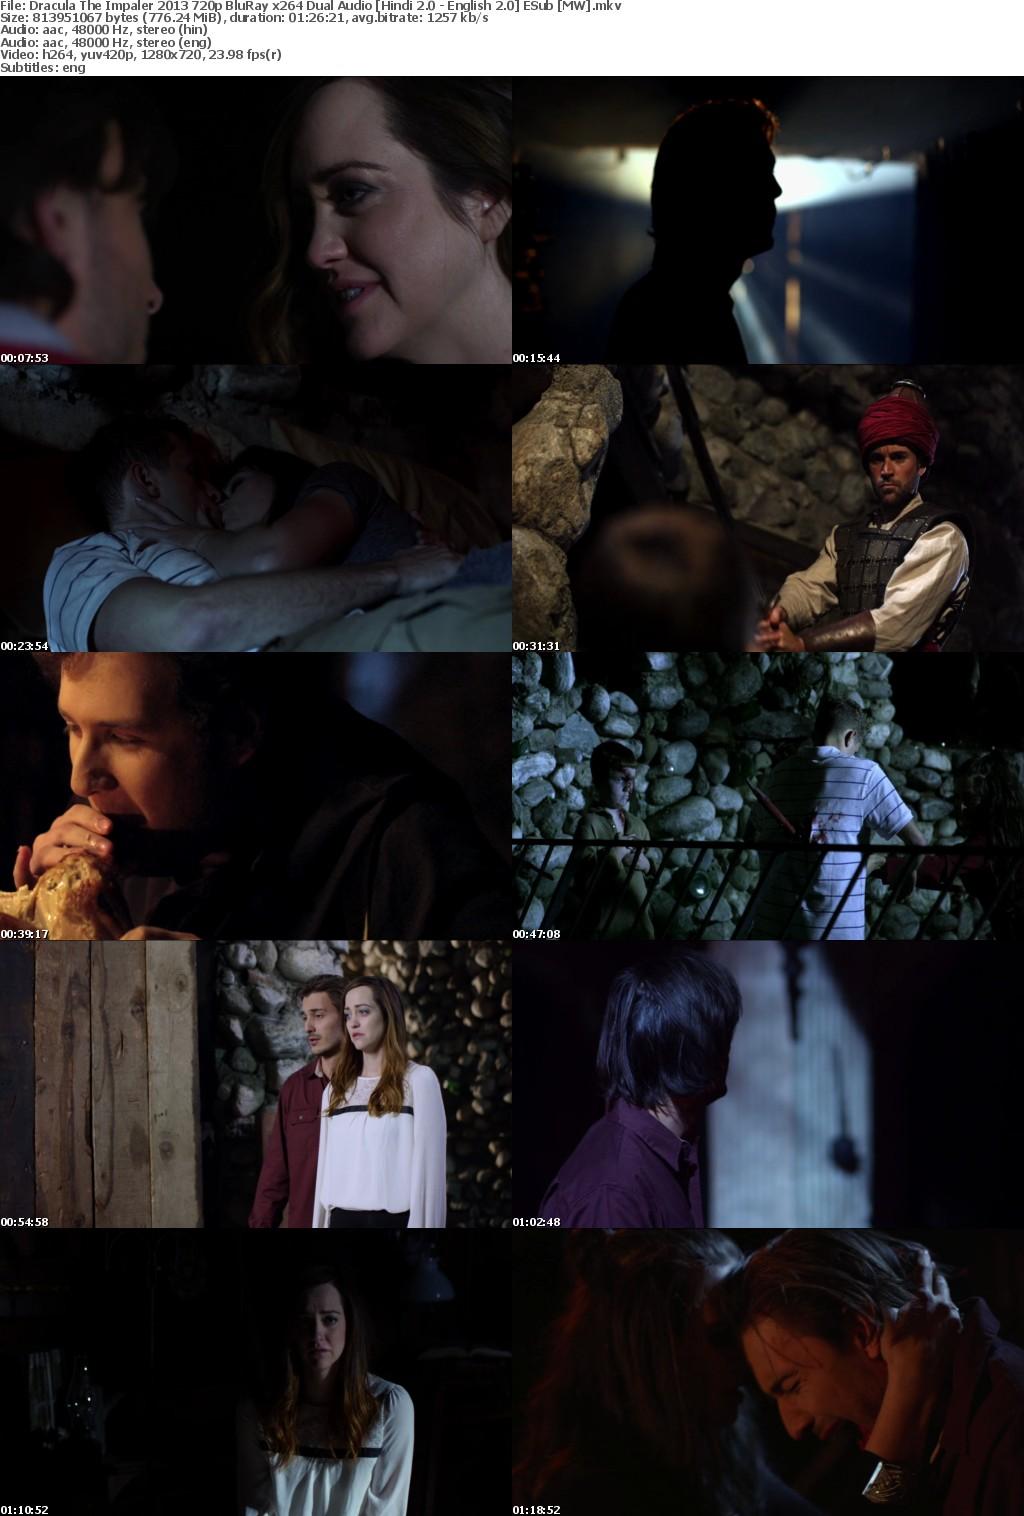 Dracula The Impaler (2013) 720p BluRay x264 Dual Audio [Hindi 2 0 - English 2 0] ESub [MW]